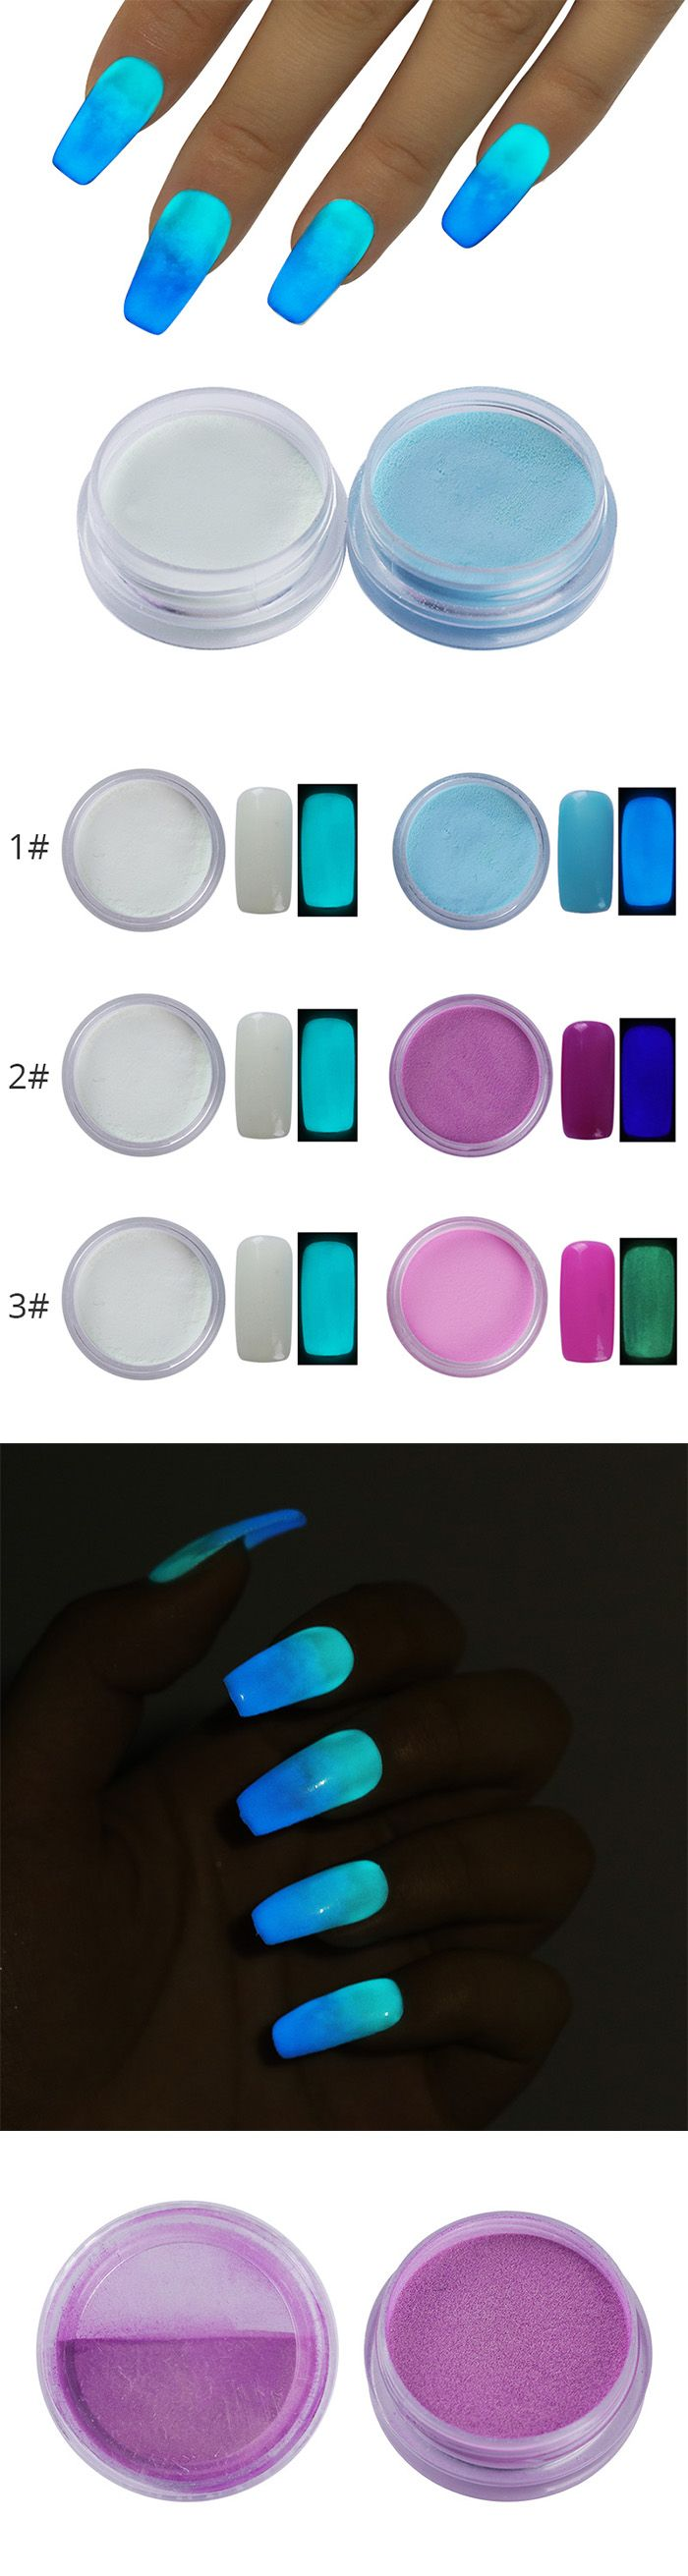 $1.99 2 Boxes Gradient Fluorescence Nail Powder Luminous Glow In Dark Glitter Nail Art Paillette Dust - BornPrettyStore.com